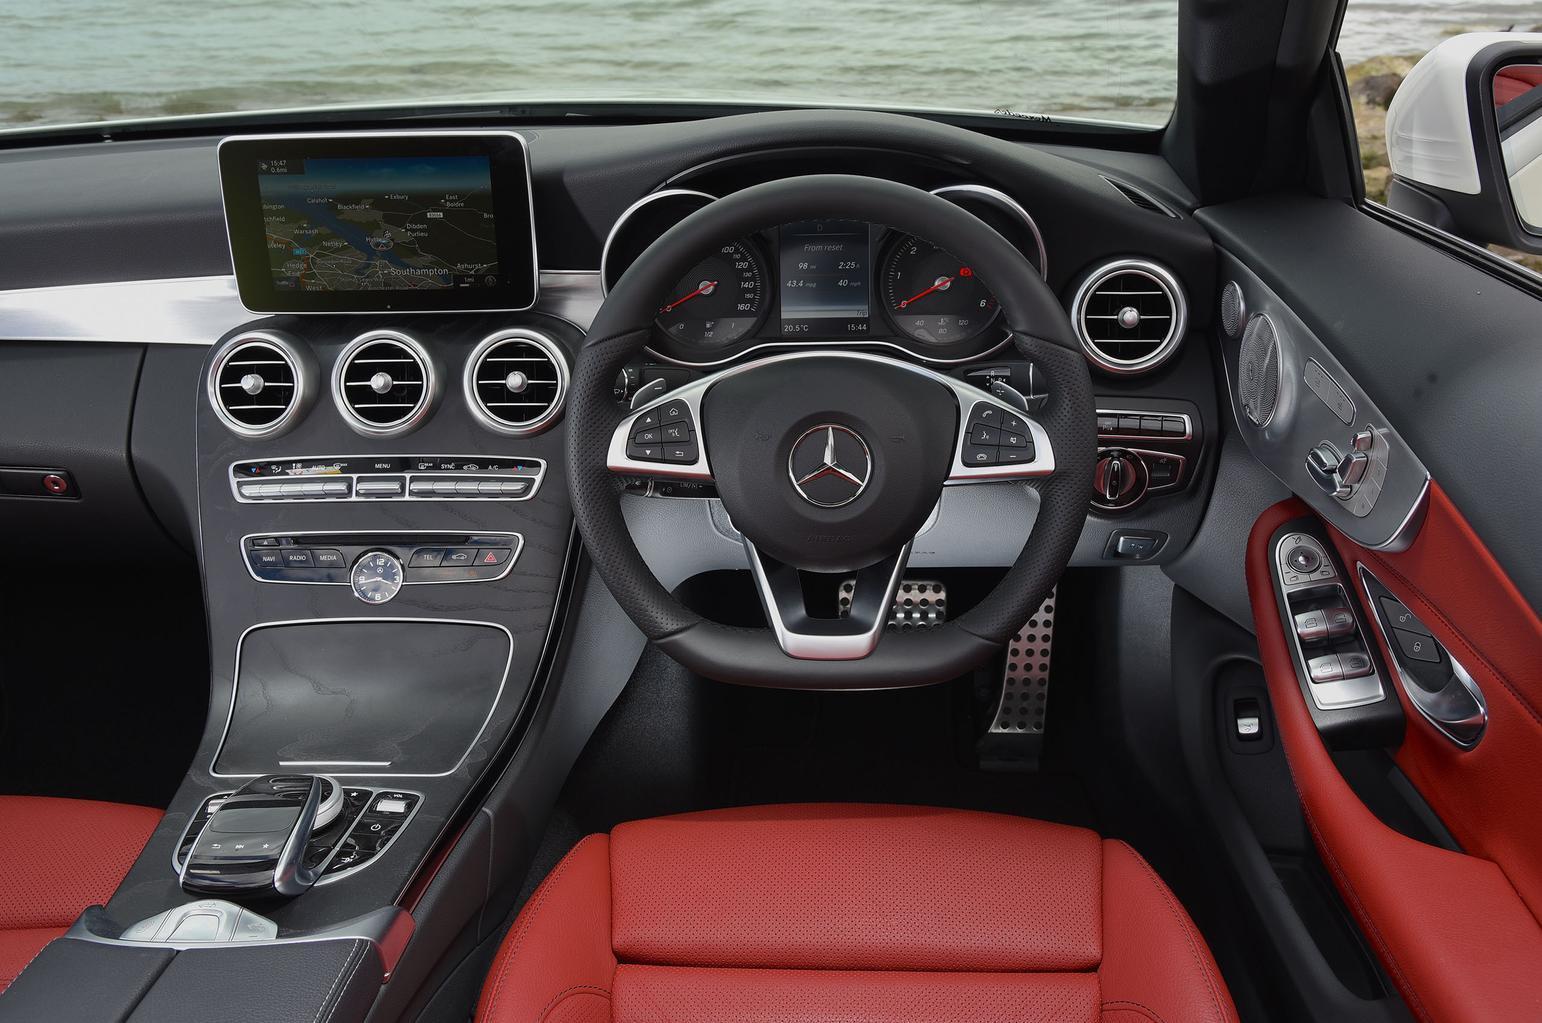 2016 Mercedes-Benz C 220 d Cabriolet review